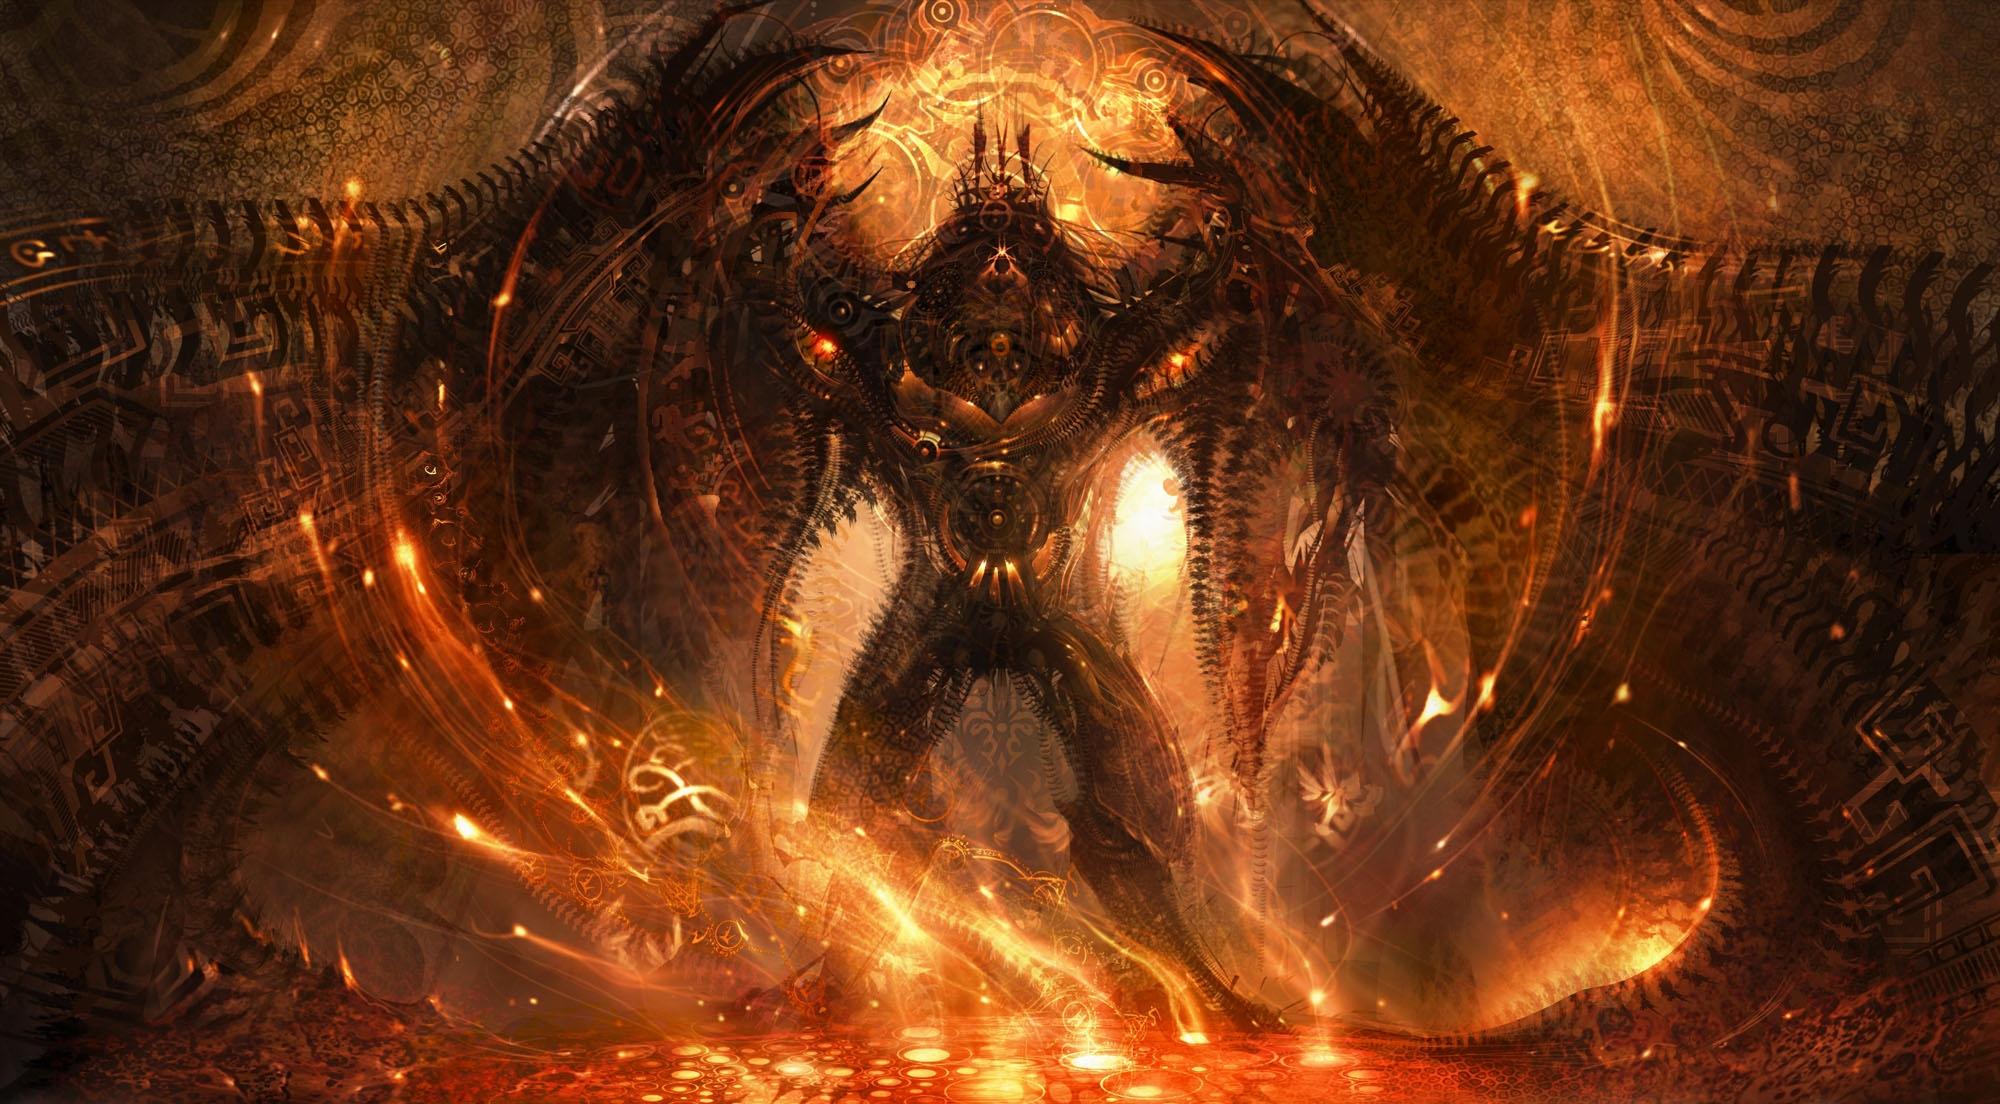 Demon Wallpapers 1280x1024px 786384 2000x1104